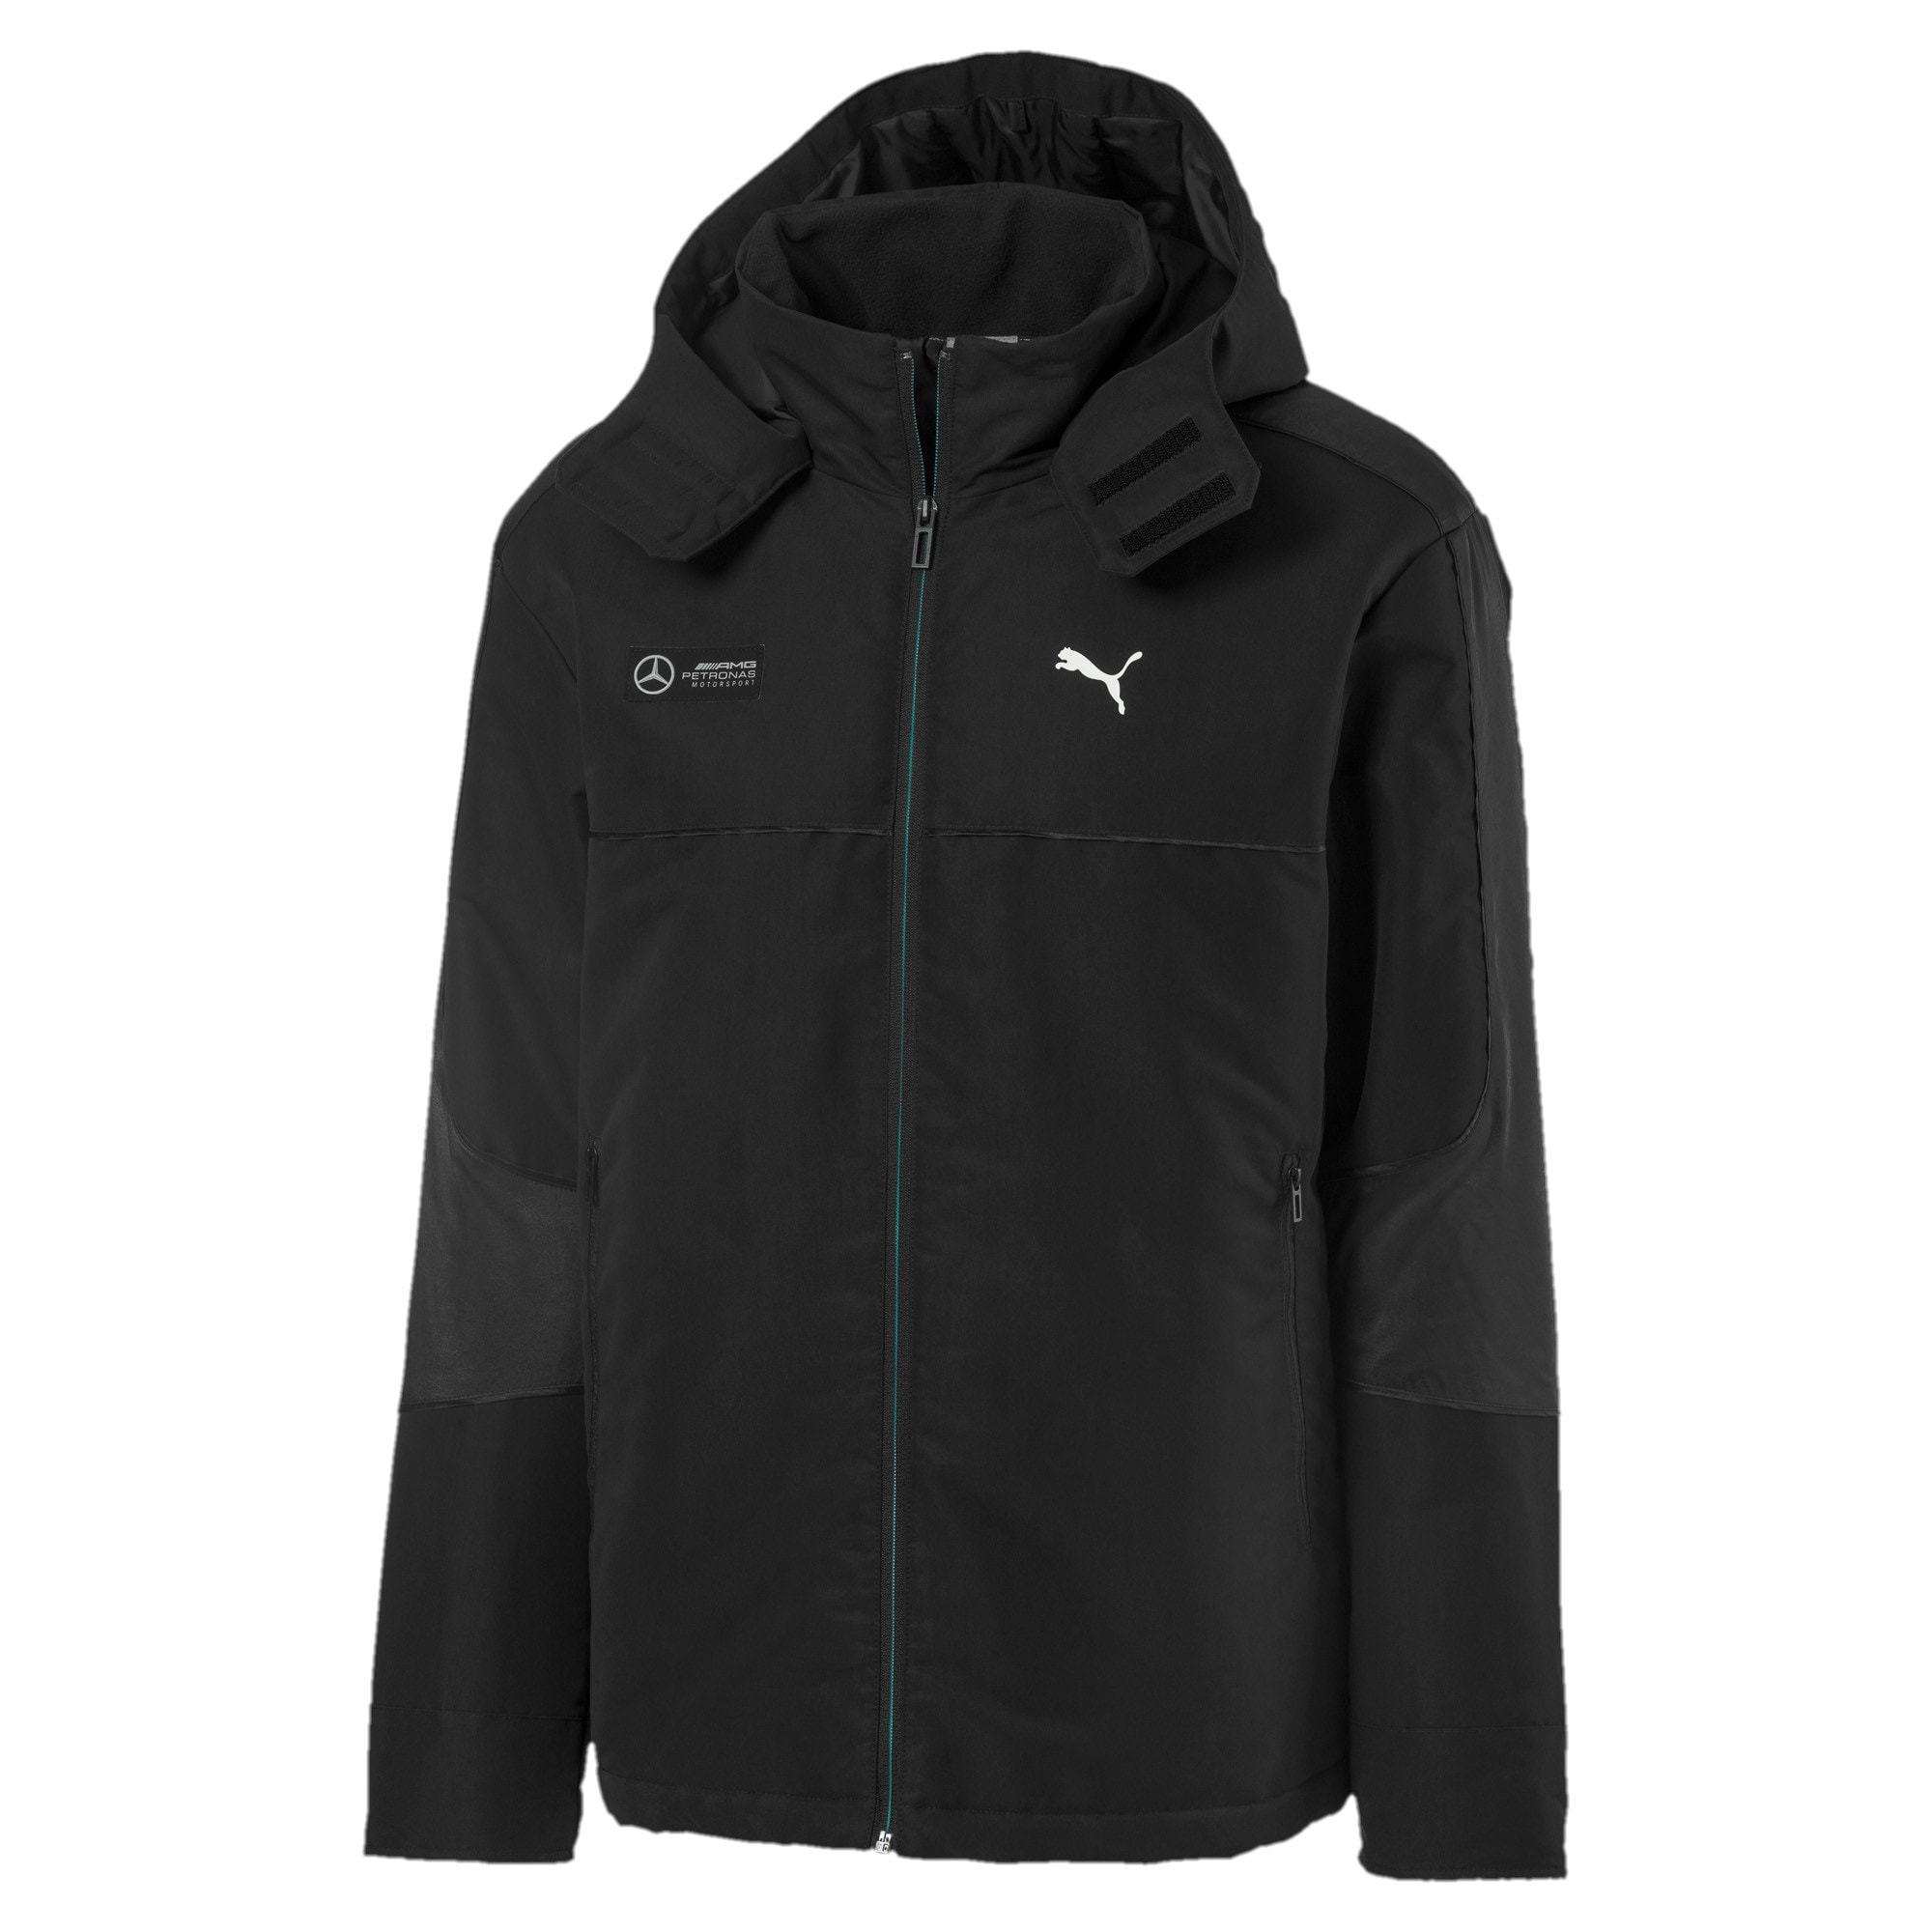 Thumbnail 1 of Mercedes RCT Men's Jacket, Puma Black, medium